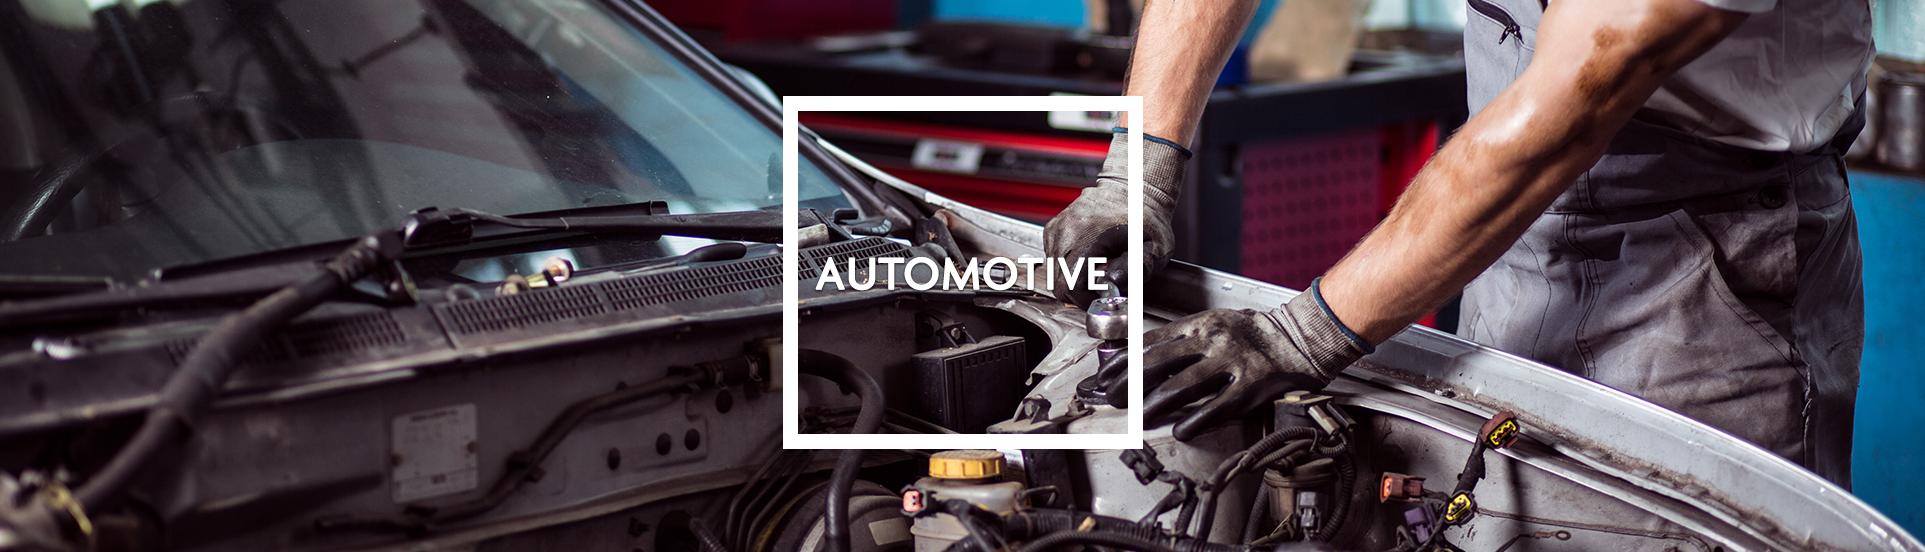 Automotive Business Banner.png